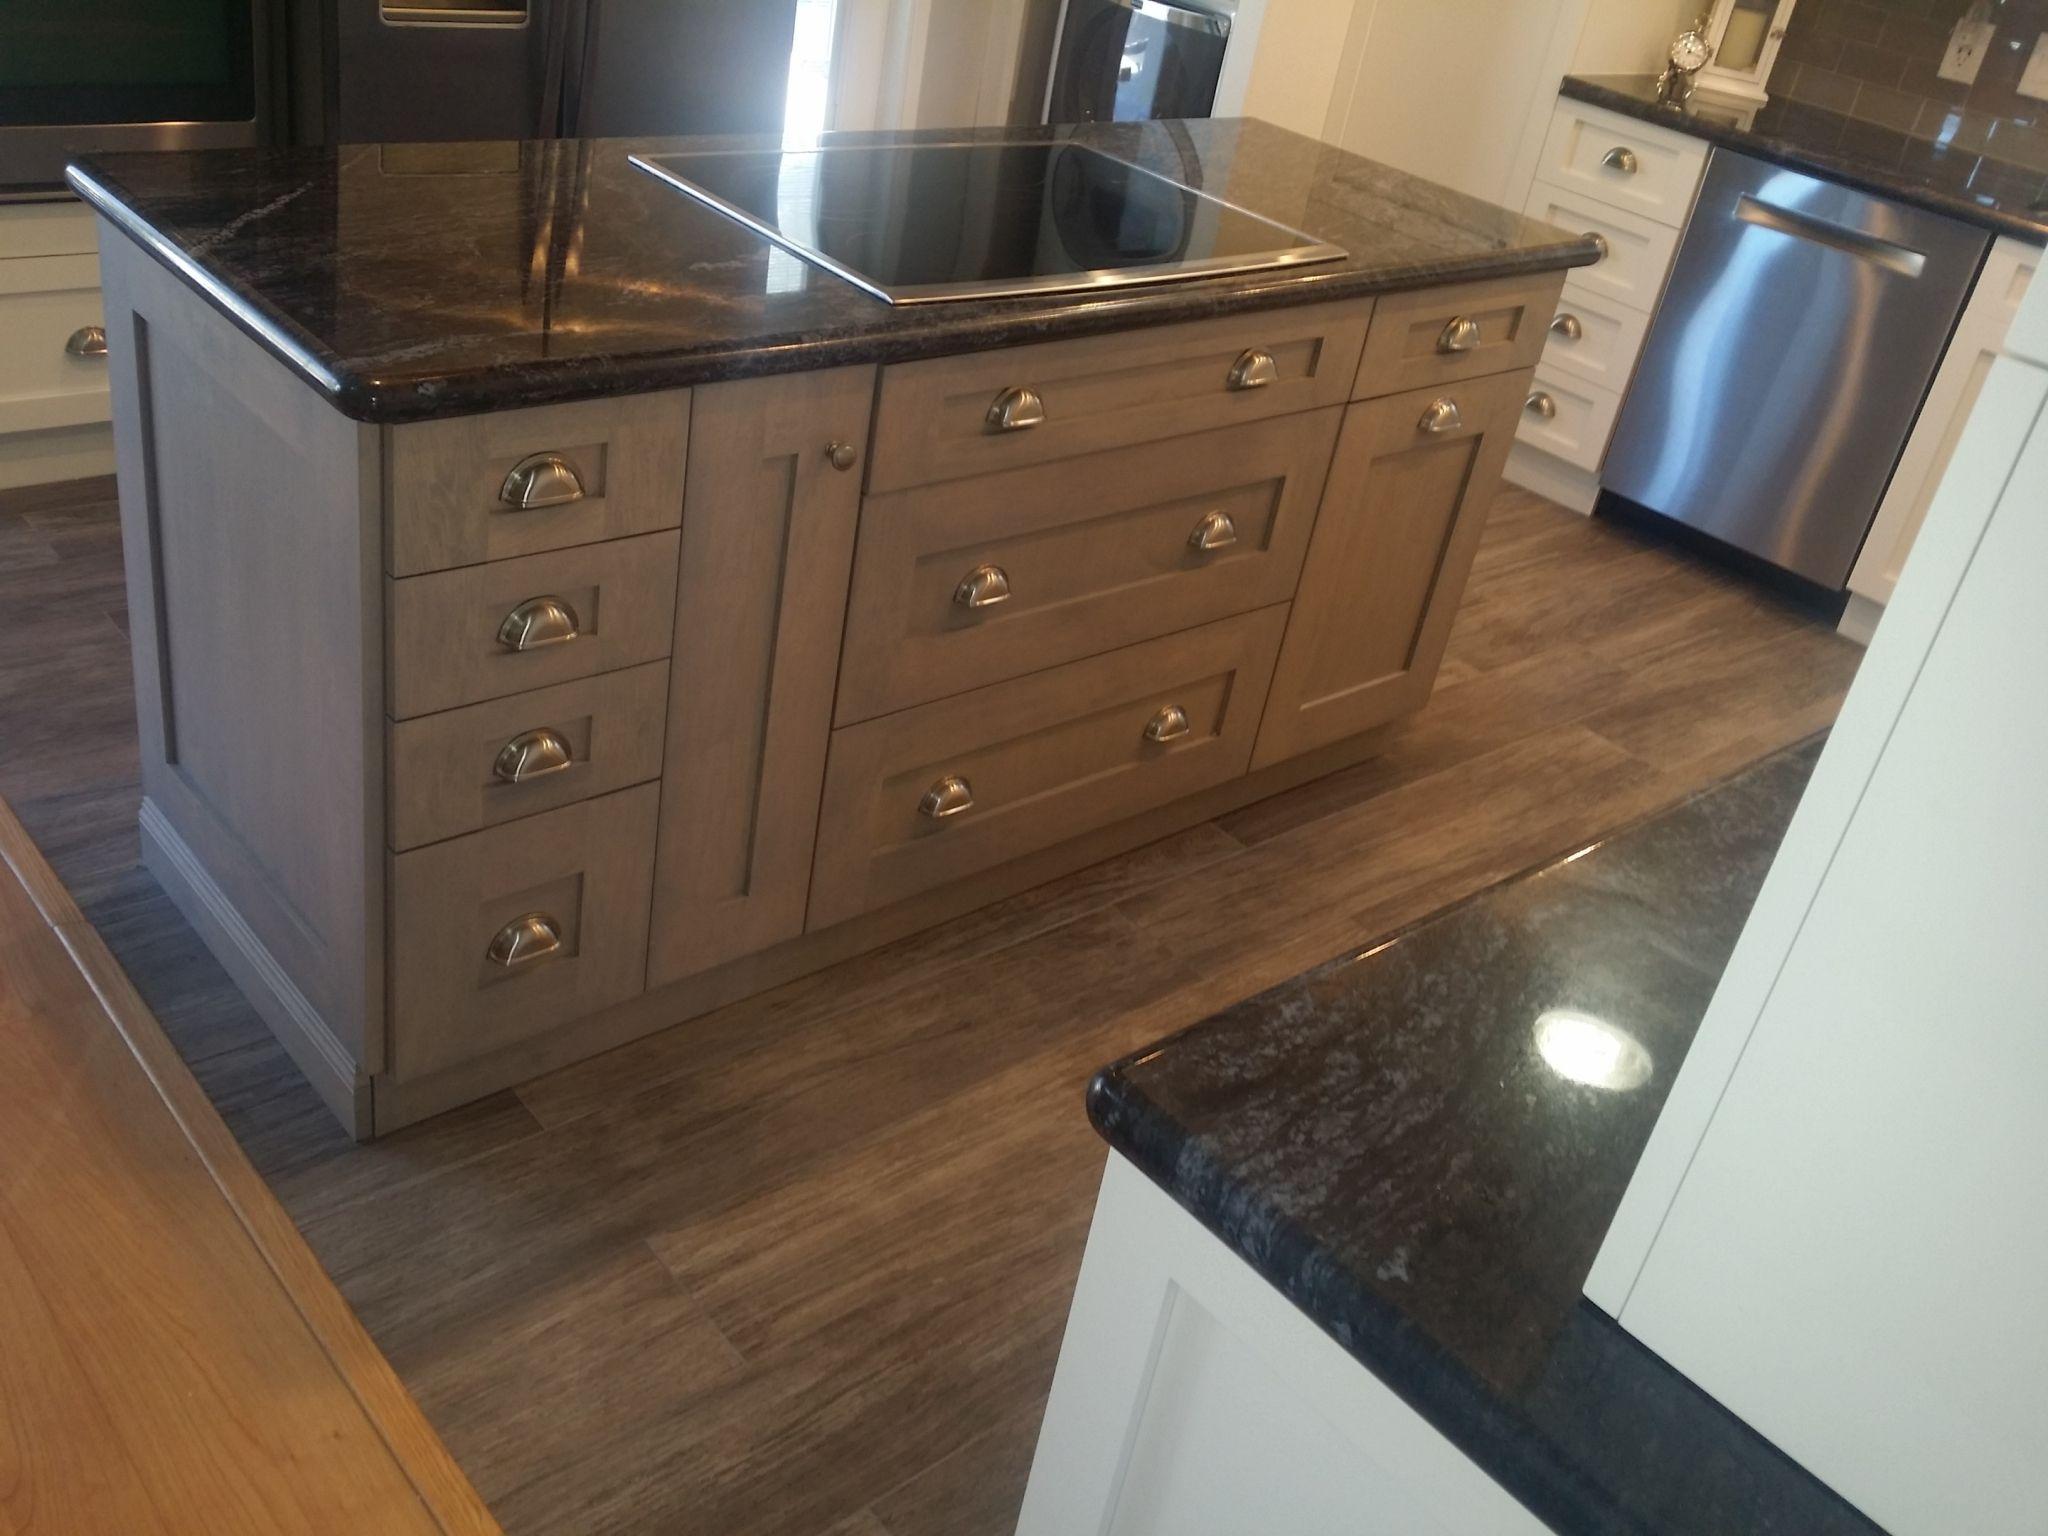 kitchen cabinets orange county ca - ranch kitchen remodel ideas